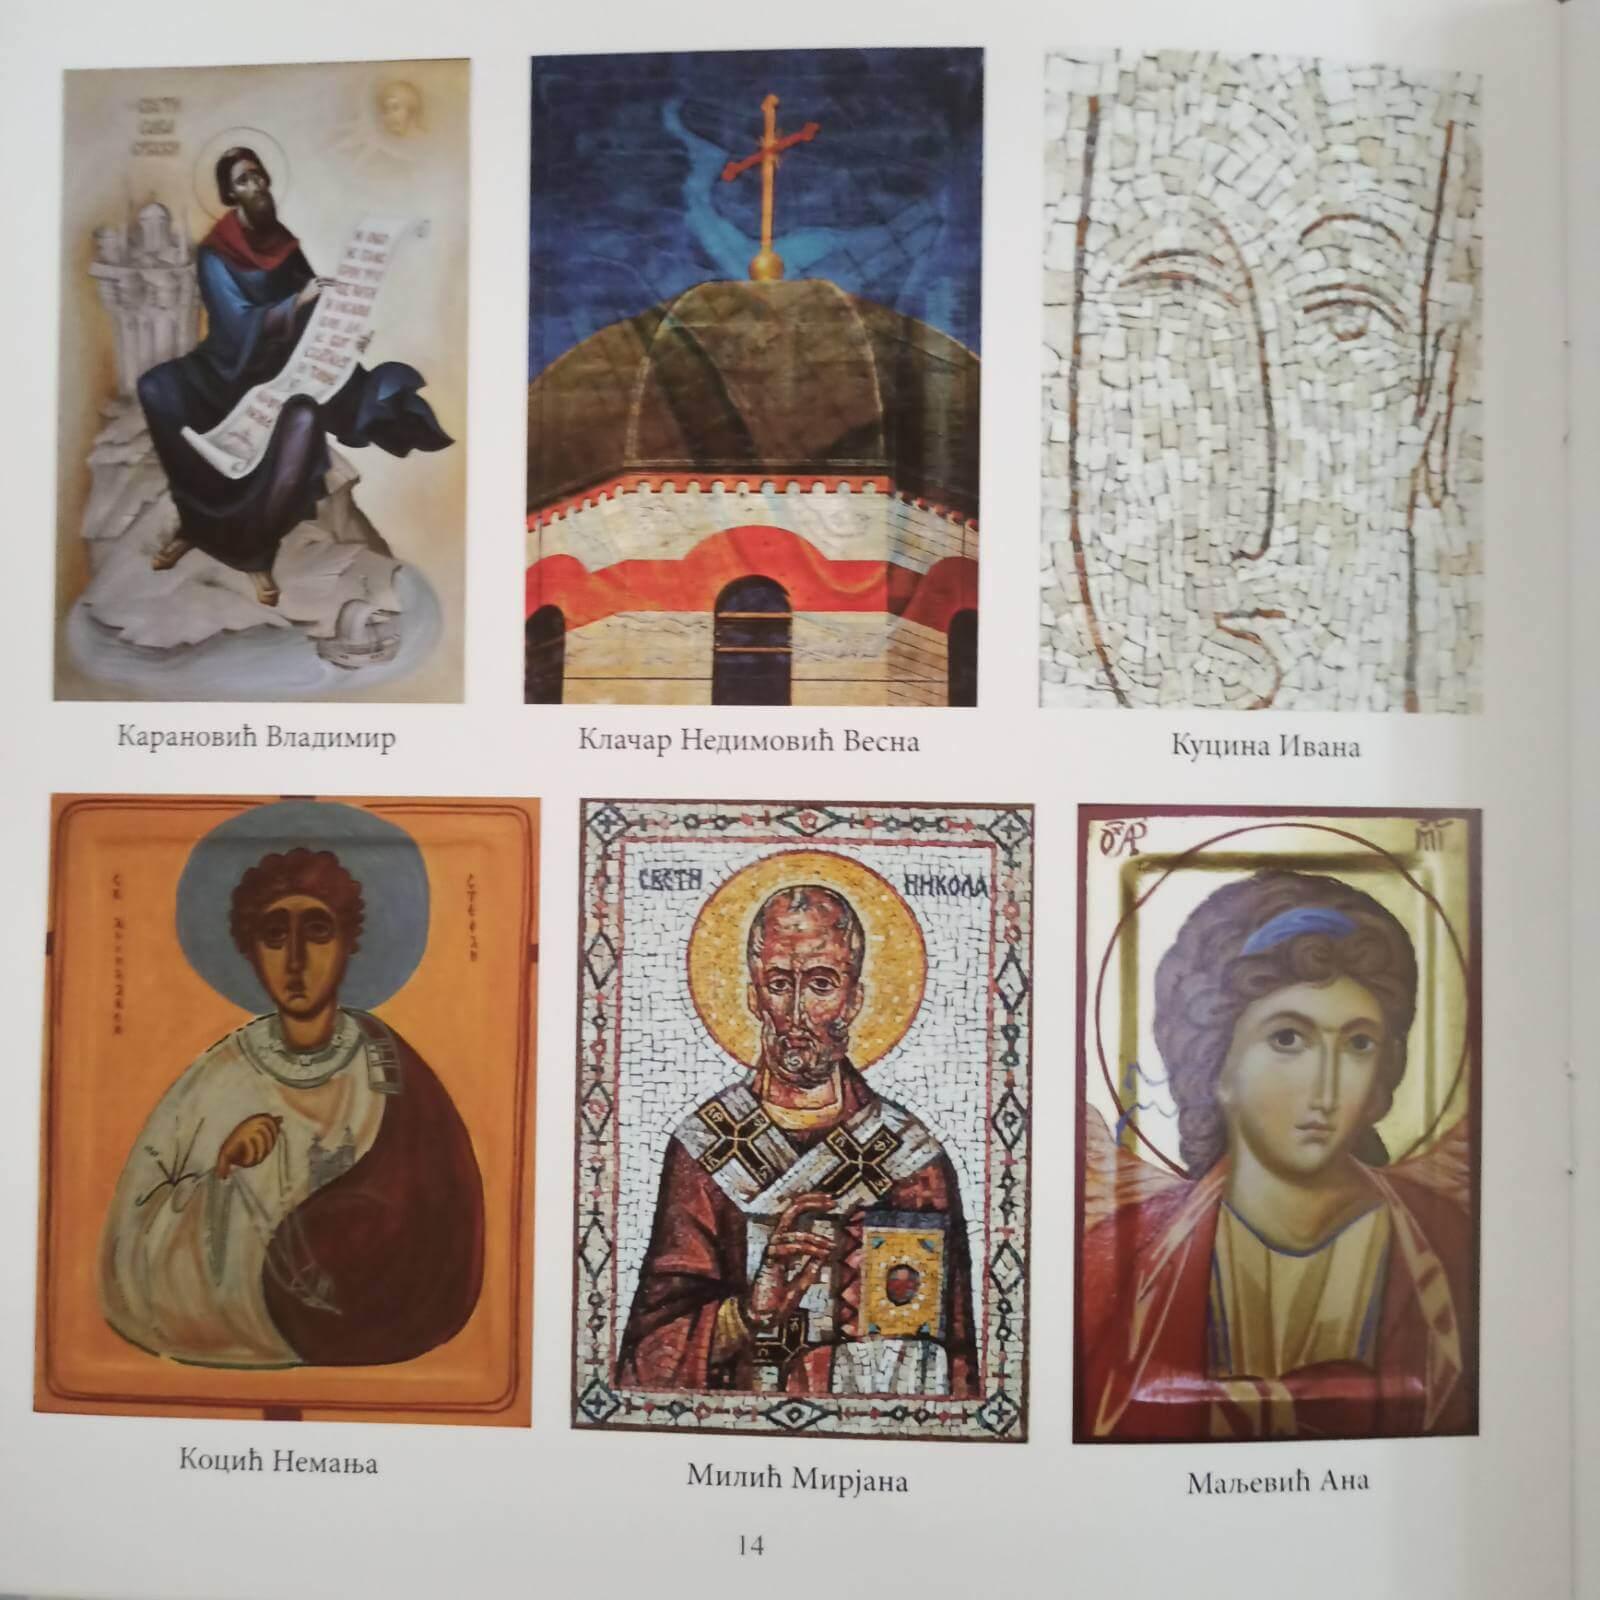 Ana Maljevic - Pravslavne ikone po narudžbini - Katalog izložbi 09